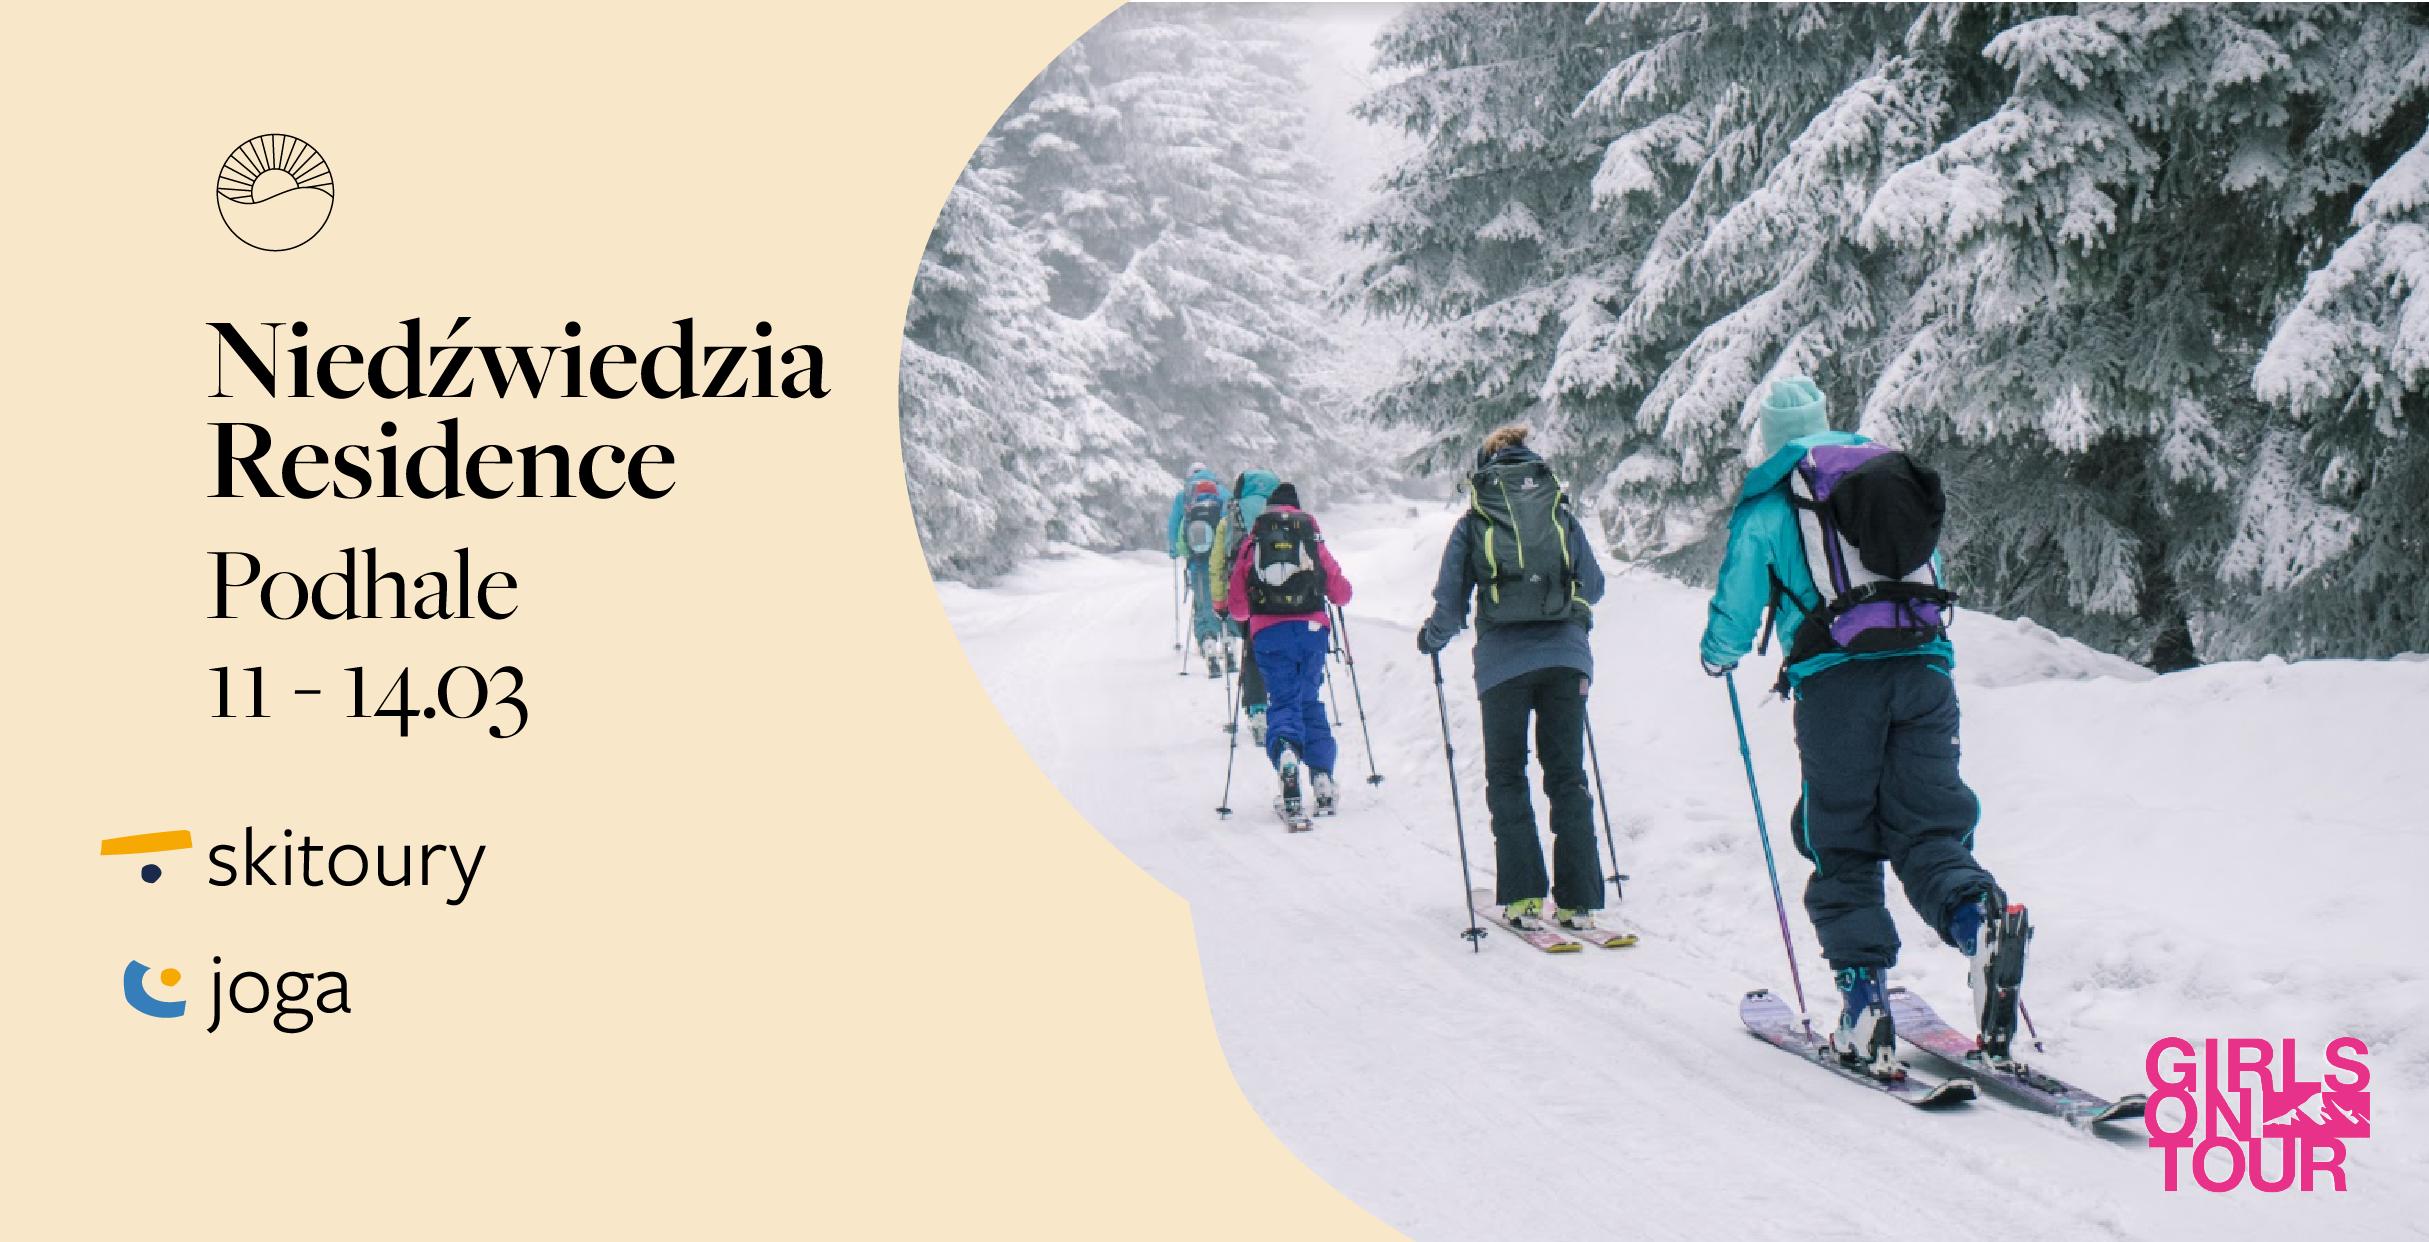 Slow weekend & skitoury & joga